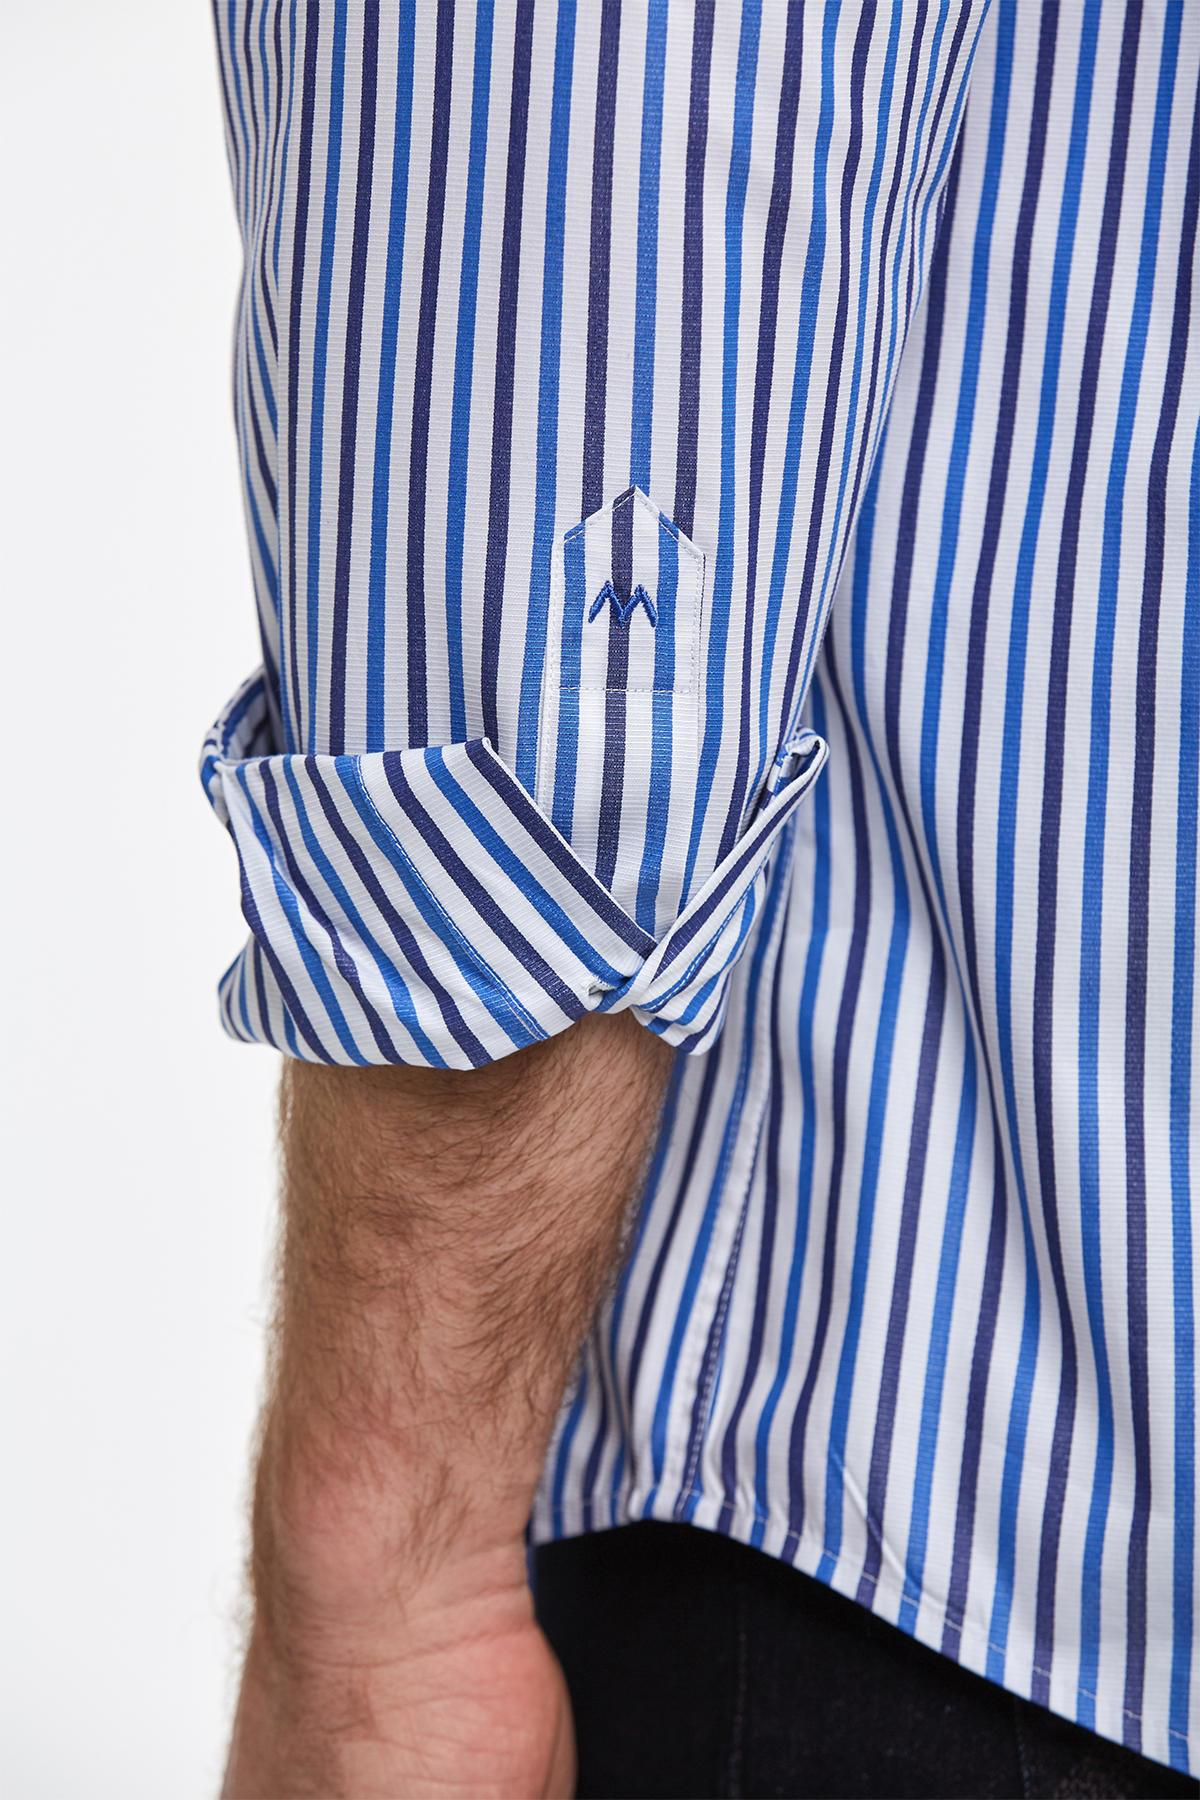 Lacivert Mavi Çizgili Pamuk Spor Gömlek